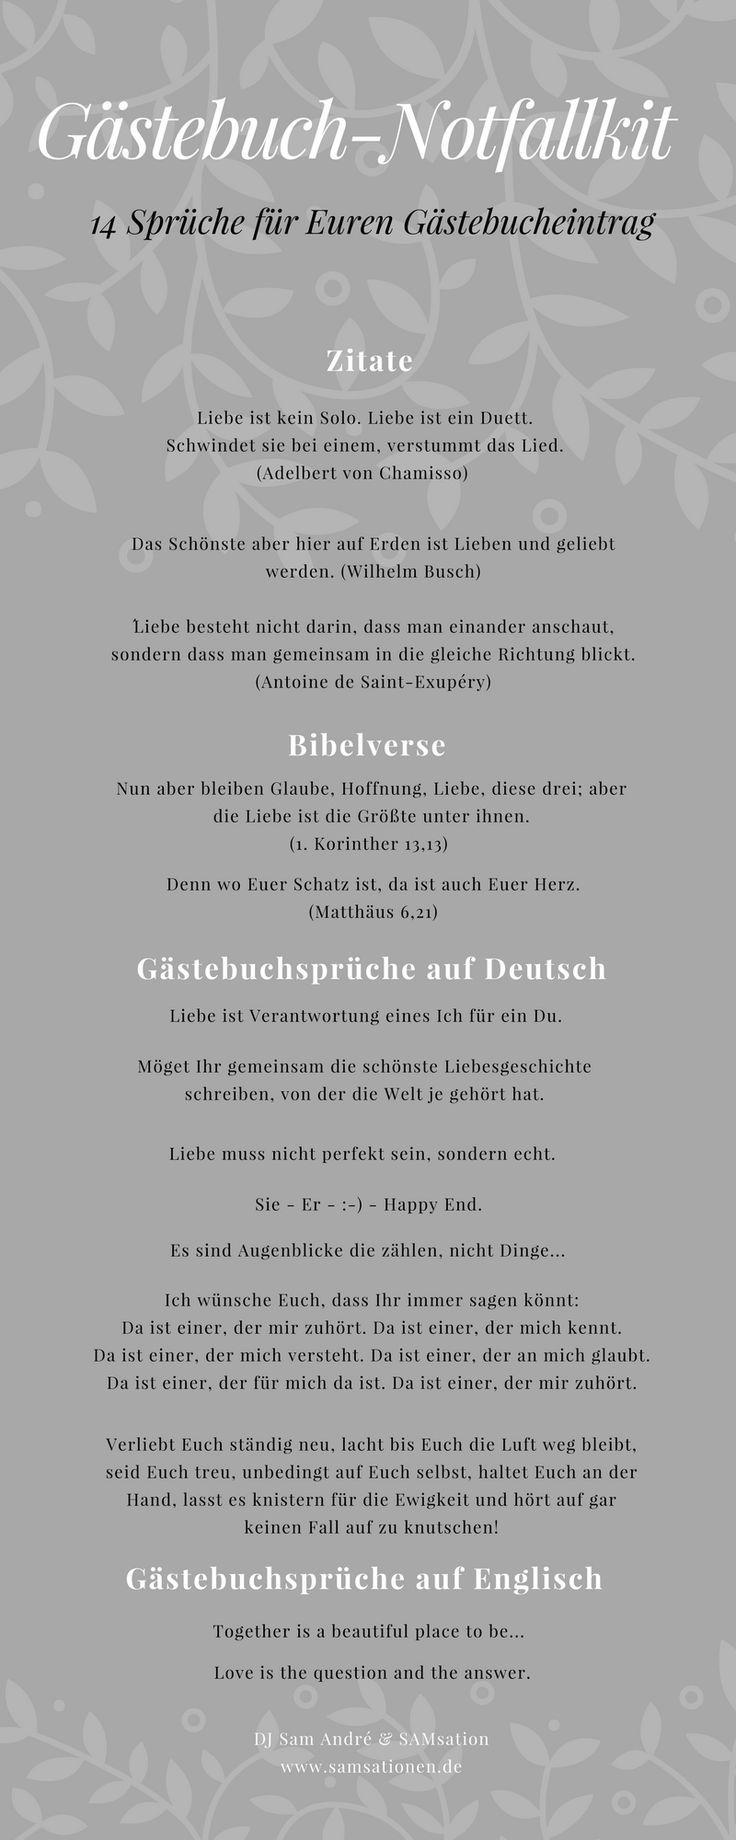 Gästebuch Emergency Kit – Hochzeits-Blog SAMsationen – #Emergency #Gästebuch #Hochzeitsblog #Kit #SAMsationen